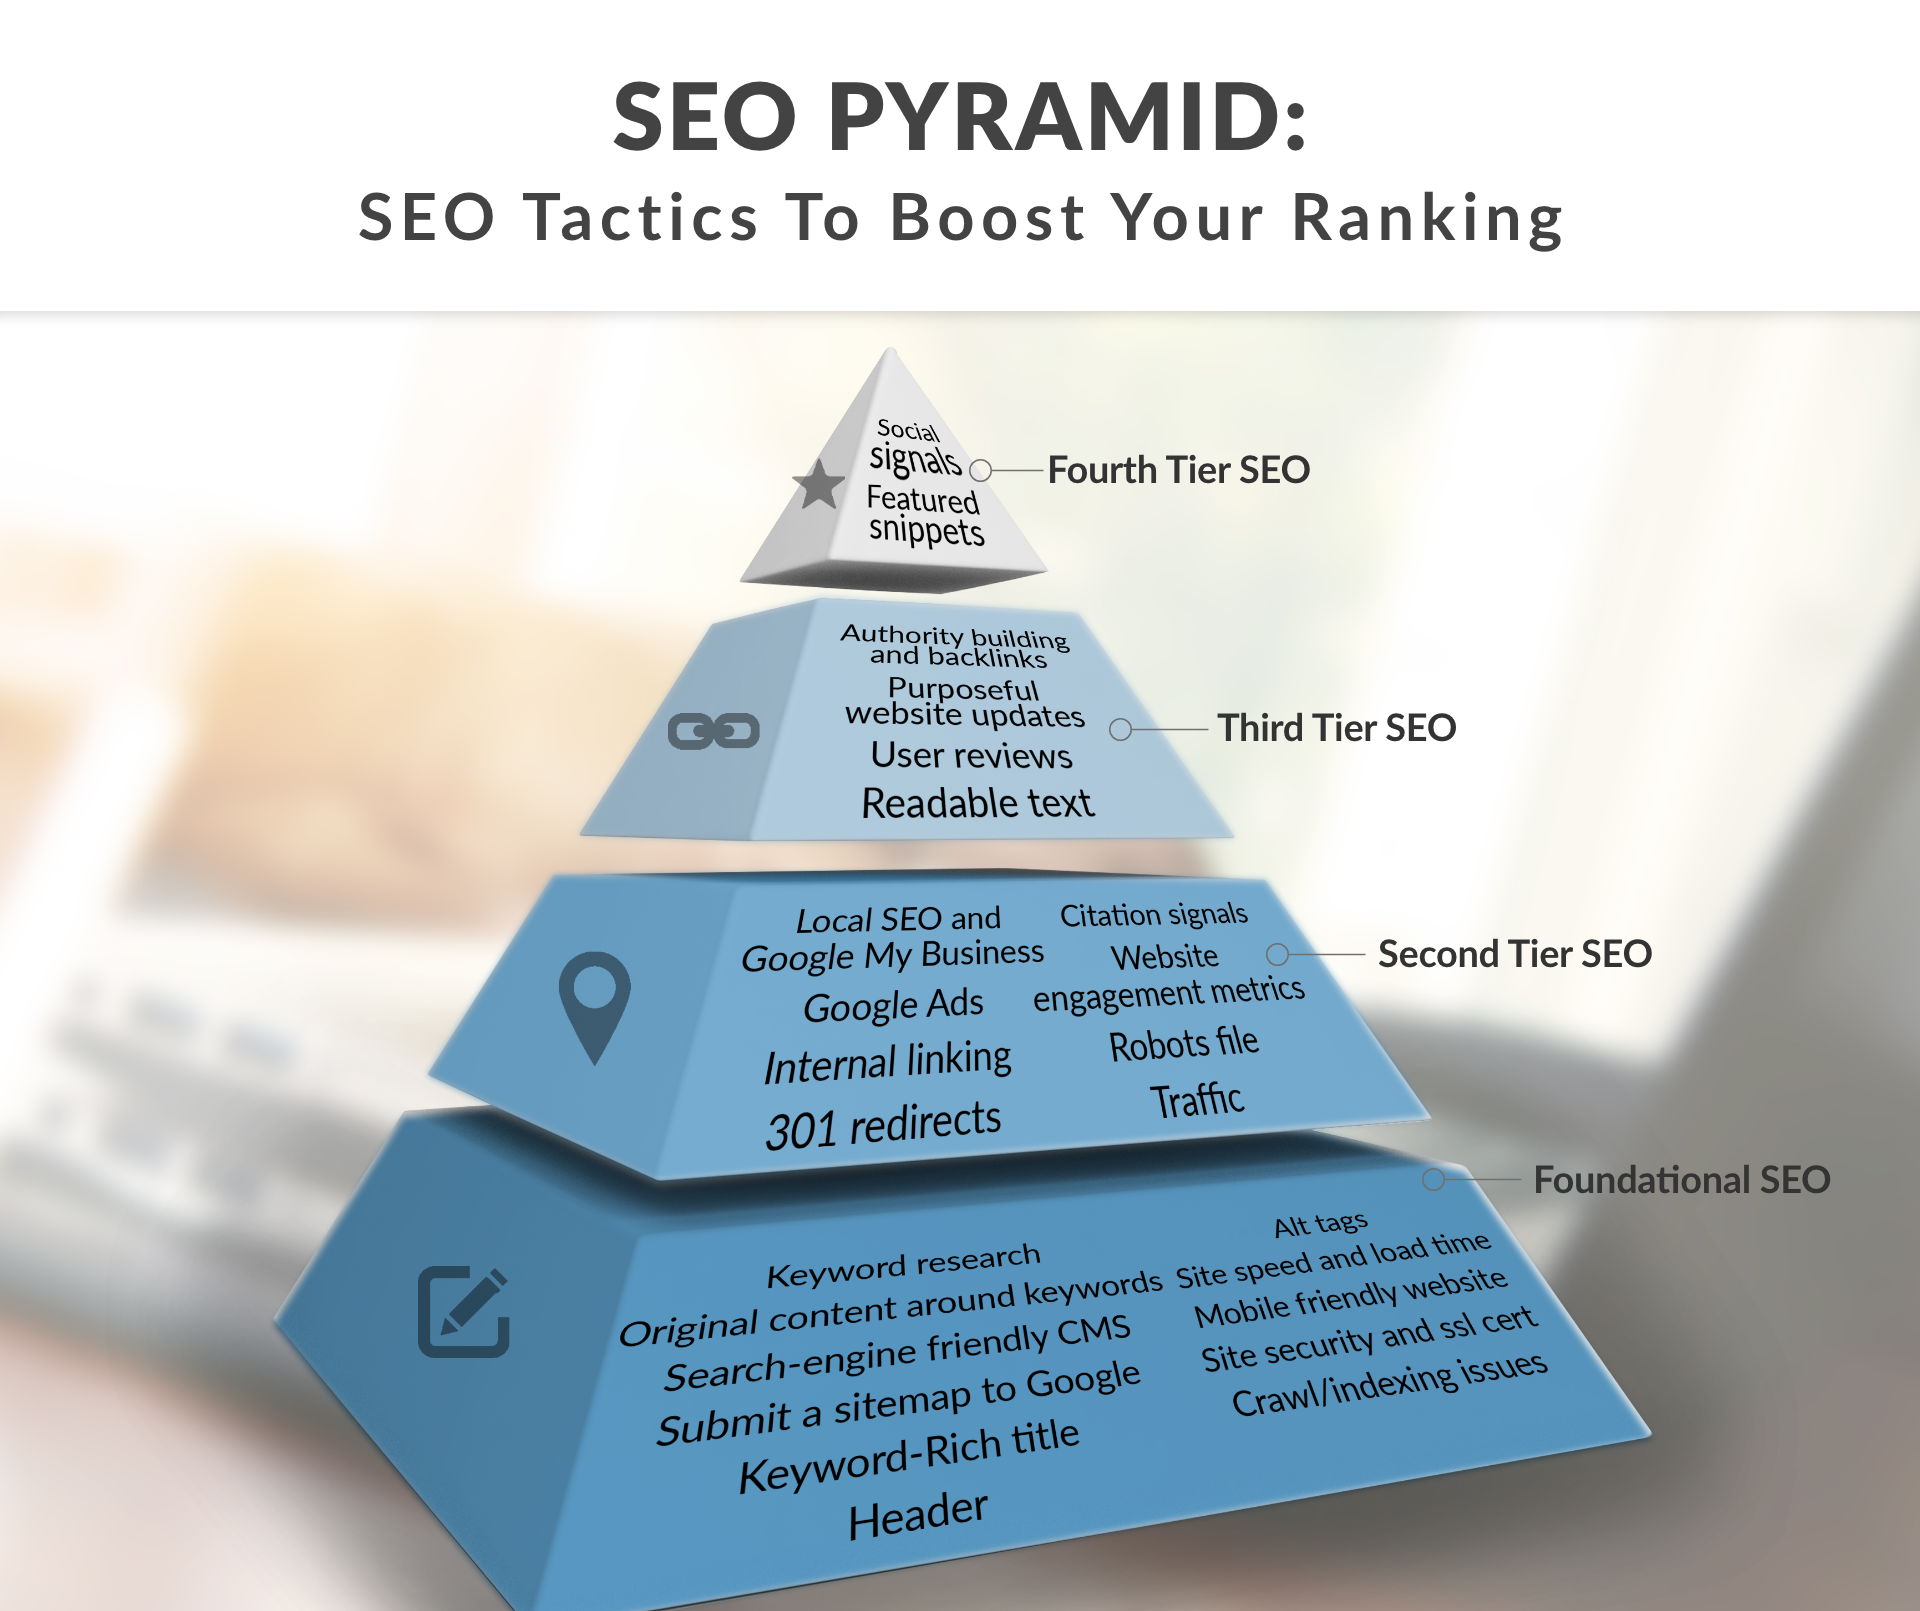 Create Hummingbird safe 4 Tier Link Pyramid using PR9 Web2 blogs